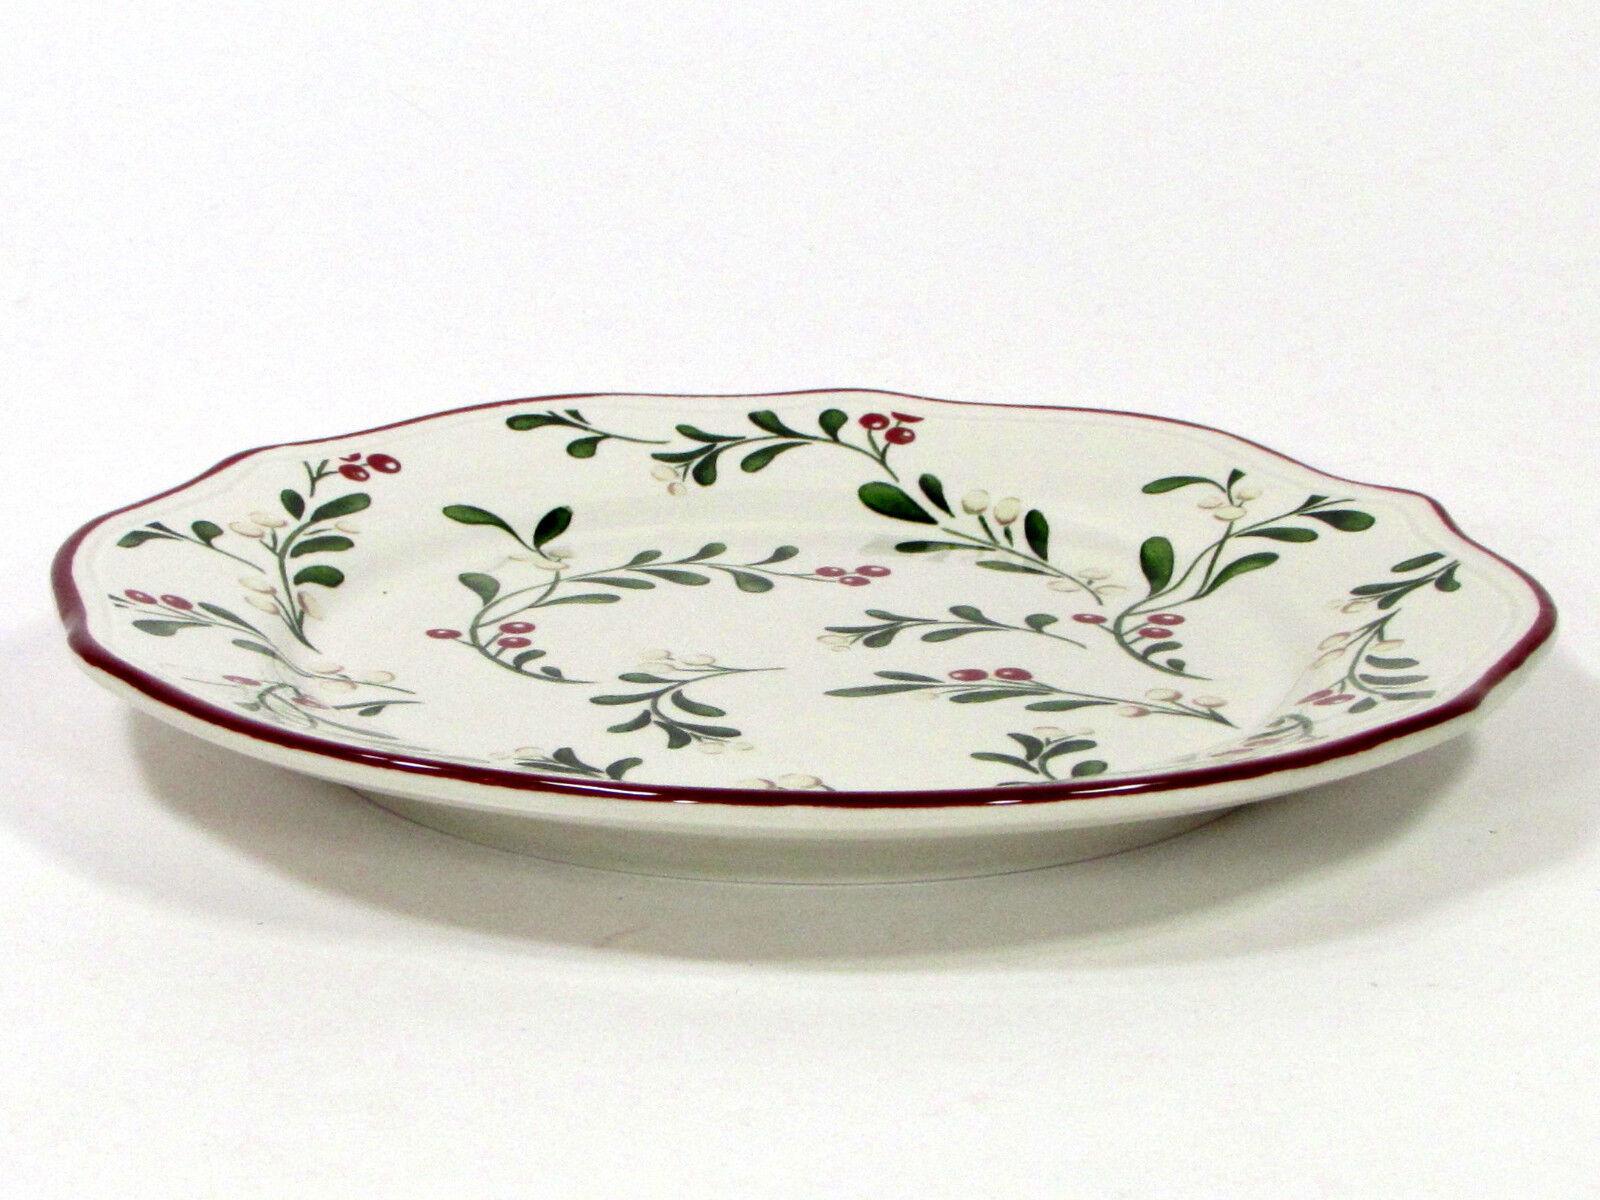 Better Homes and Gardens MISTLETOE MISTLETOE MISTLETOE 8.75  Salad Plate Set 4Pc Heritage Collection 0ab287